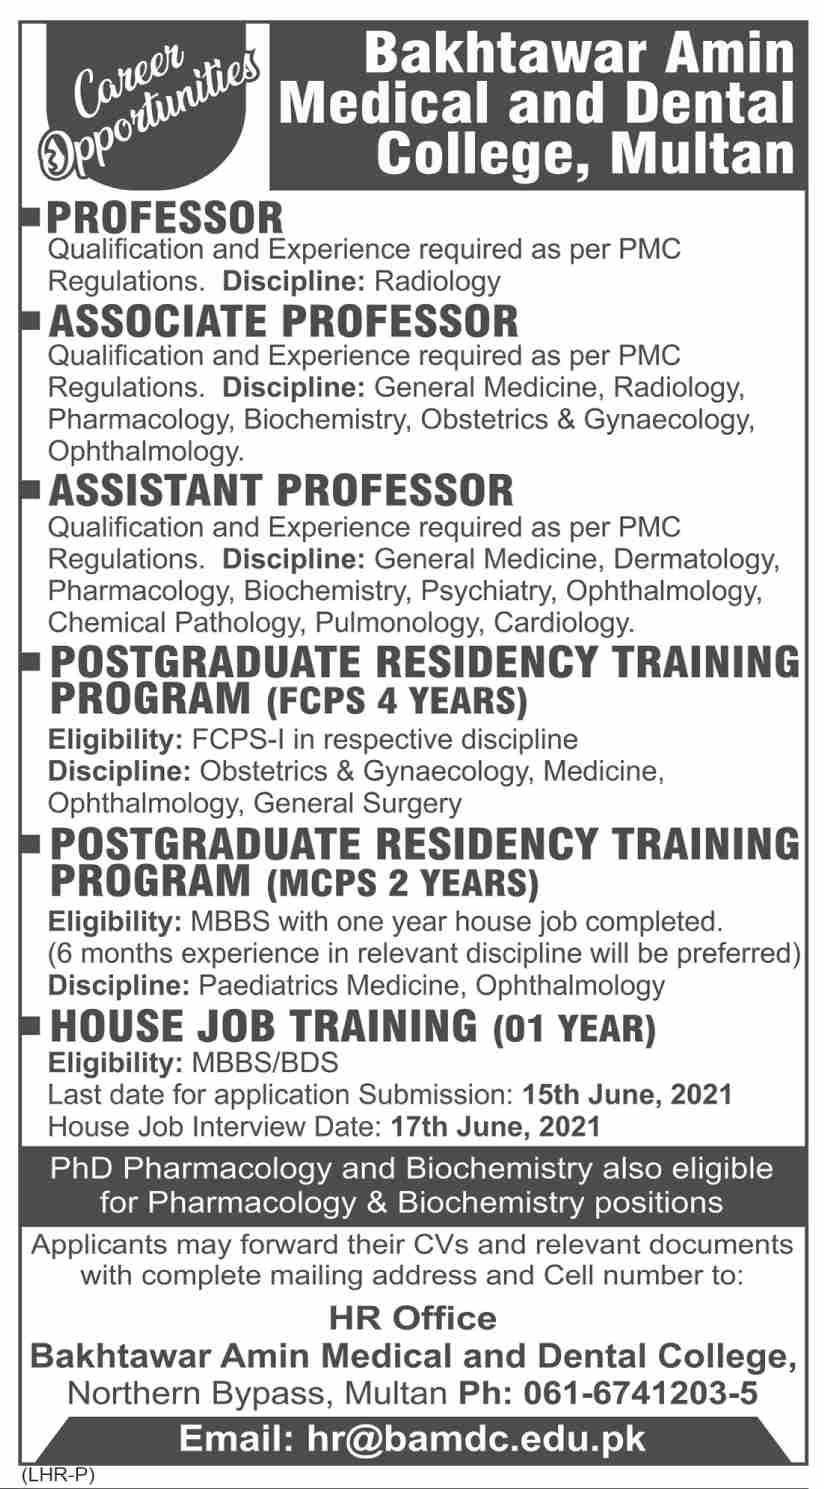 hr@bamdc.edu.pk - Bakhtawar Amin Medical And Dental College Jobs 2021 in Pakistan